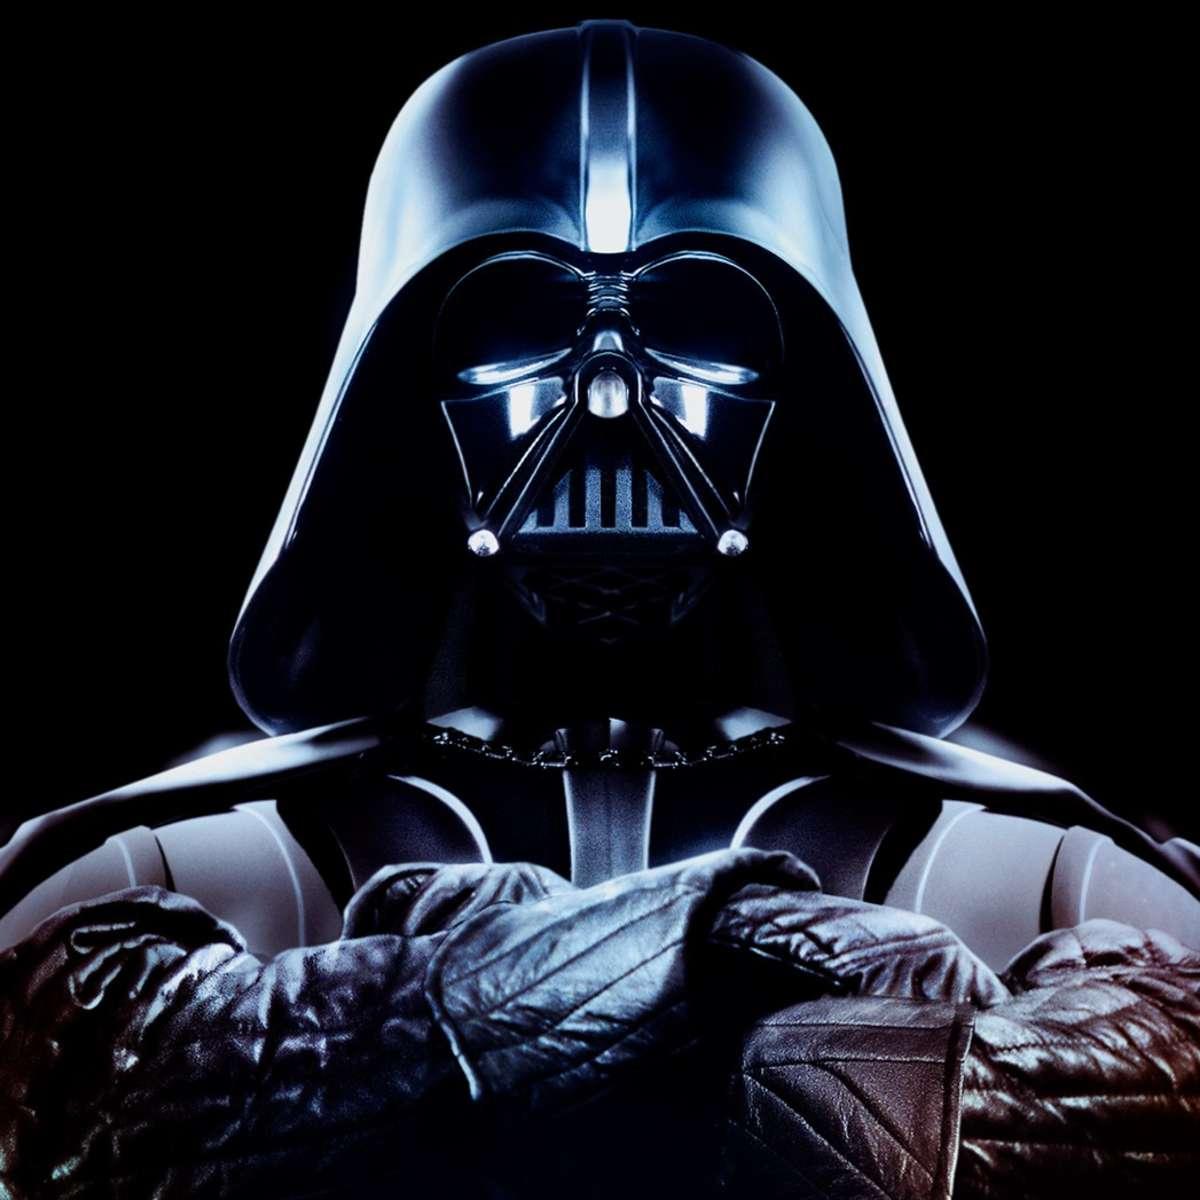 Classical-Wallpaper-Darth-Vader-star-wars-25852934-1920-1080.jpg